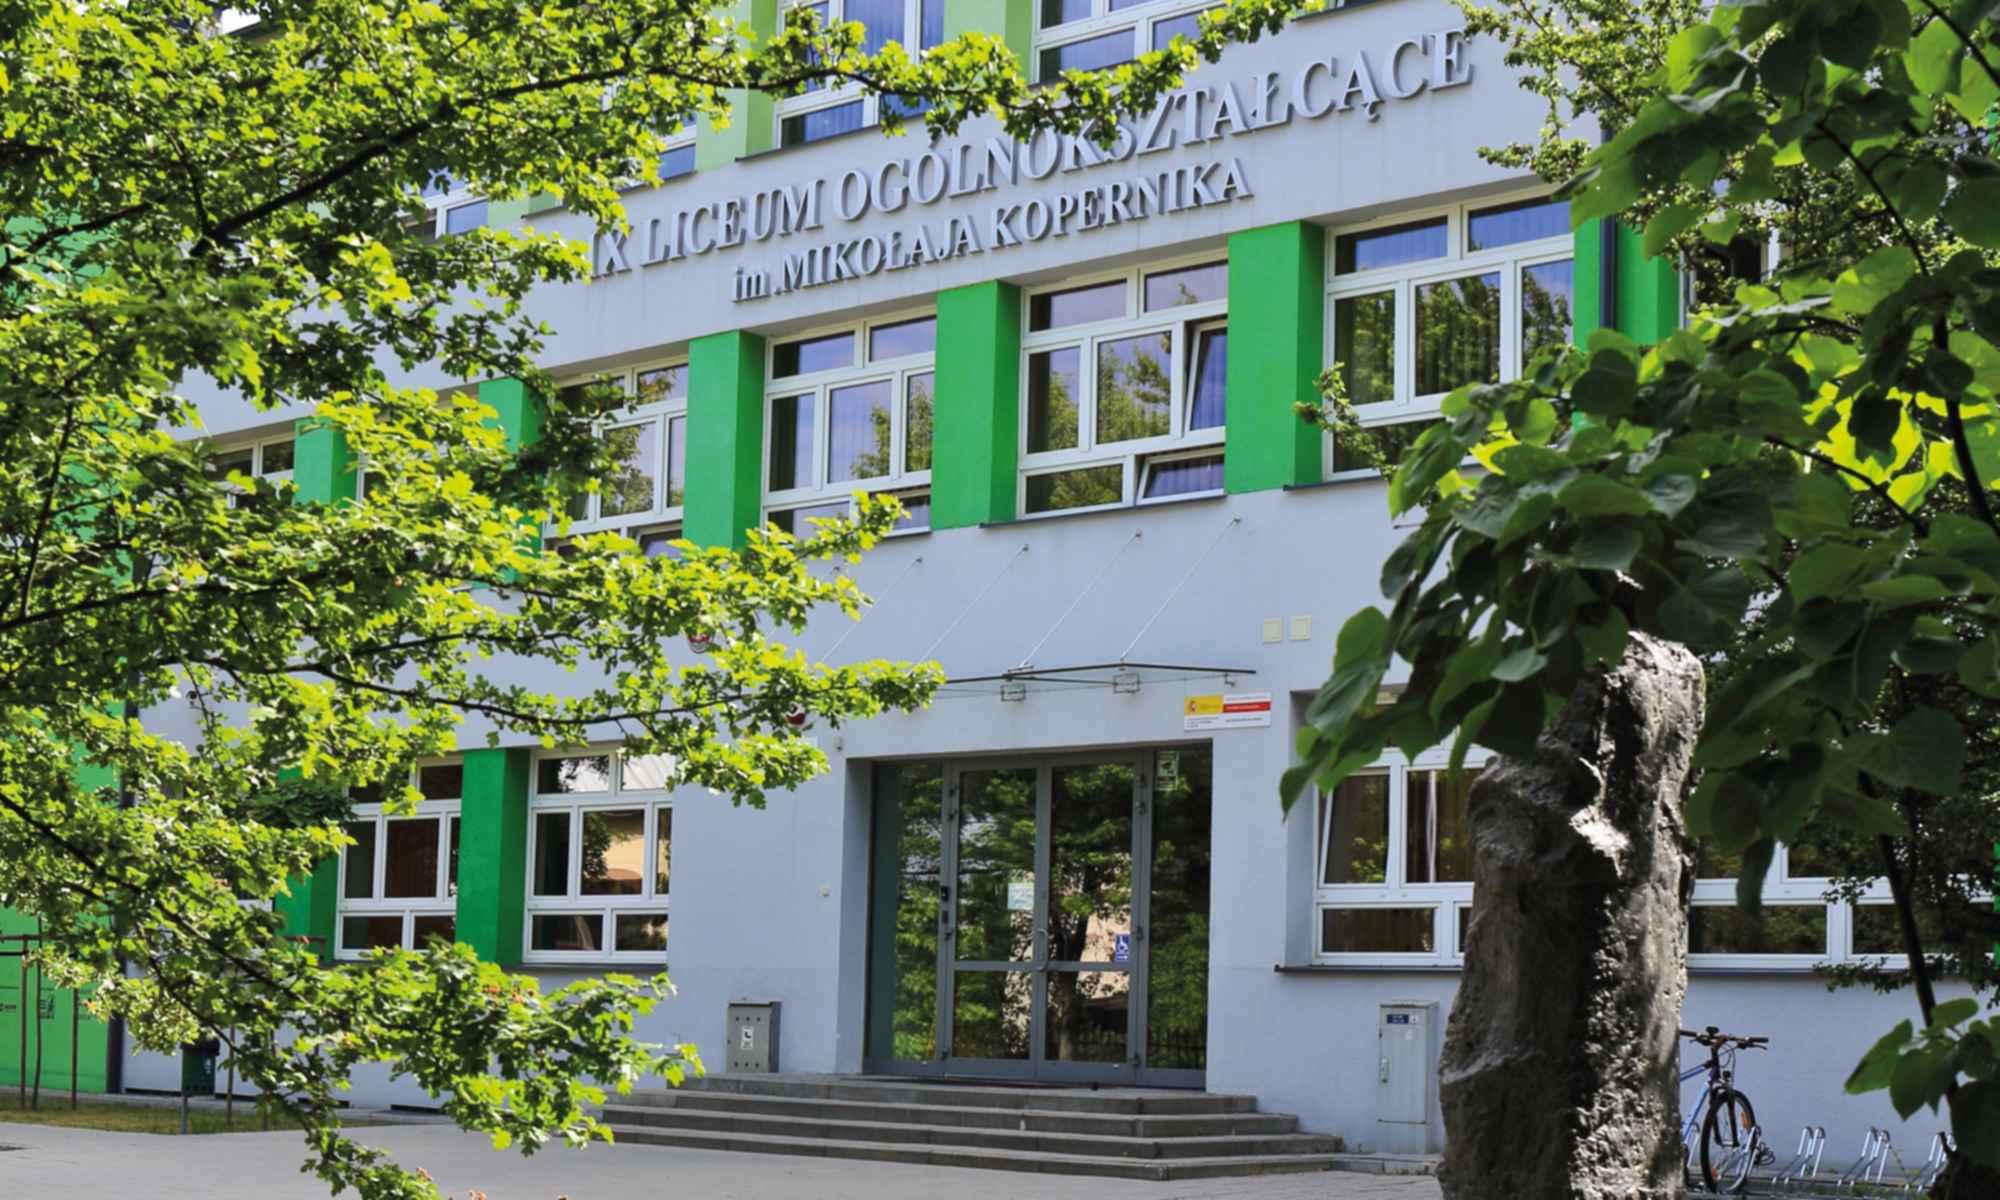 IX Liceum Ogólnokształcące